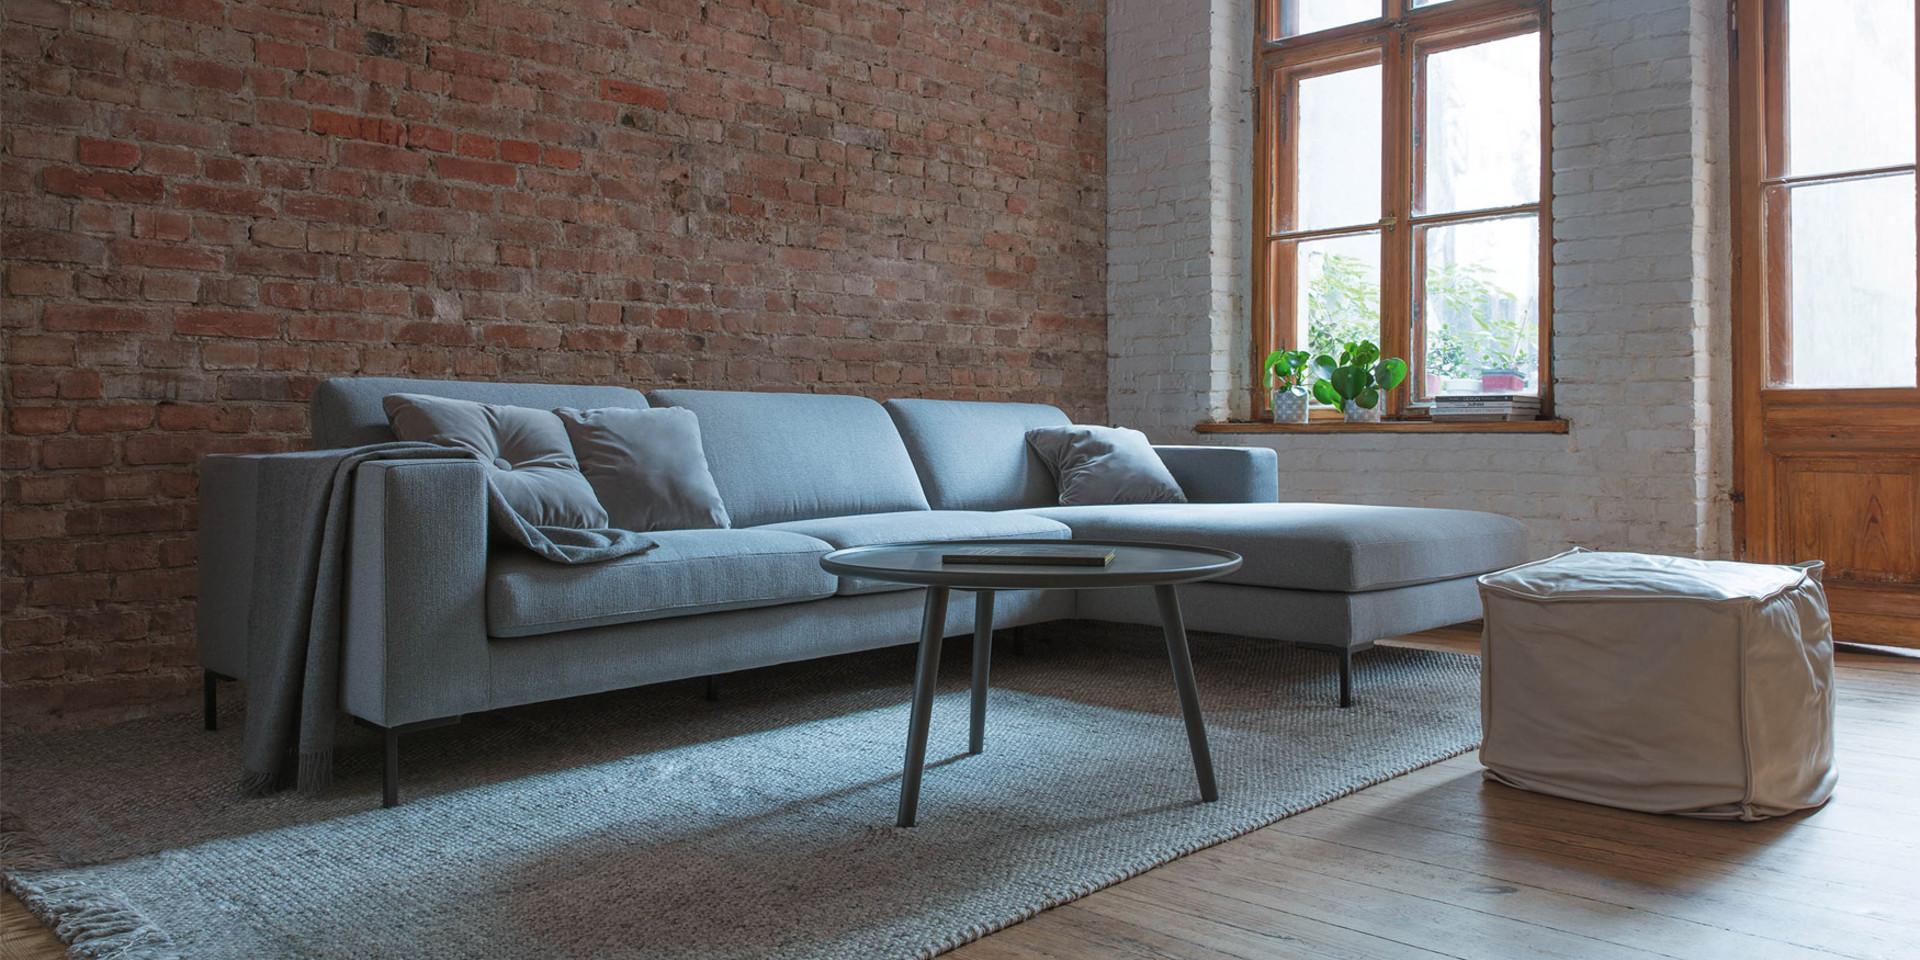 Sits Sofa Domino